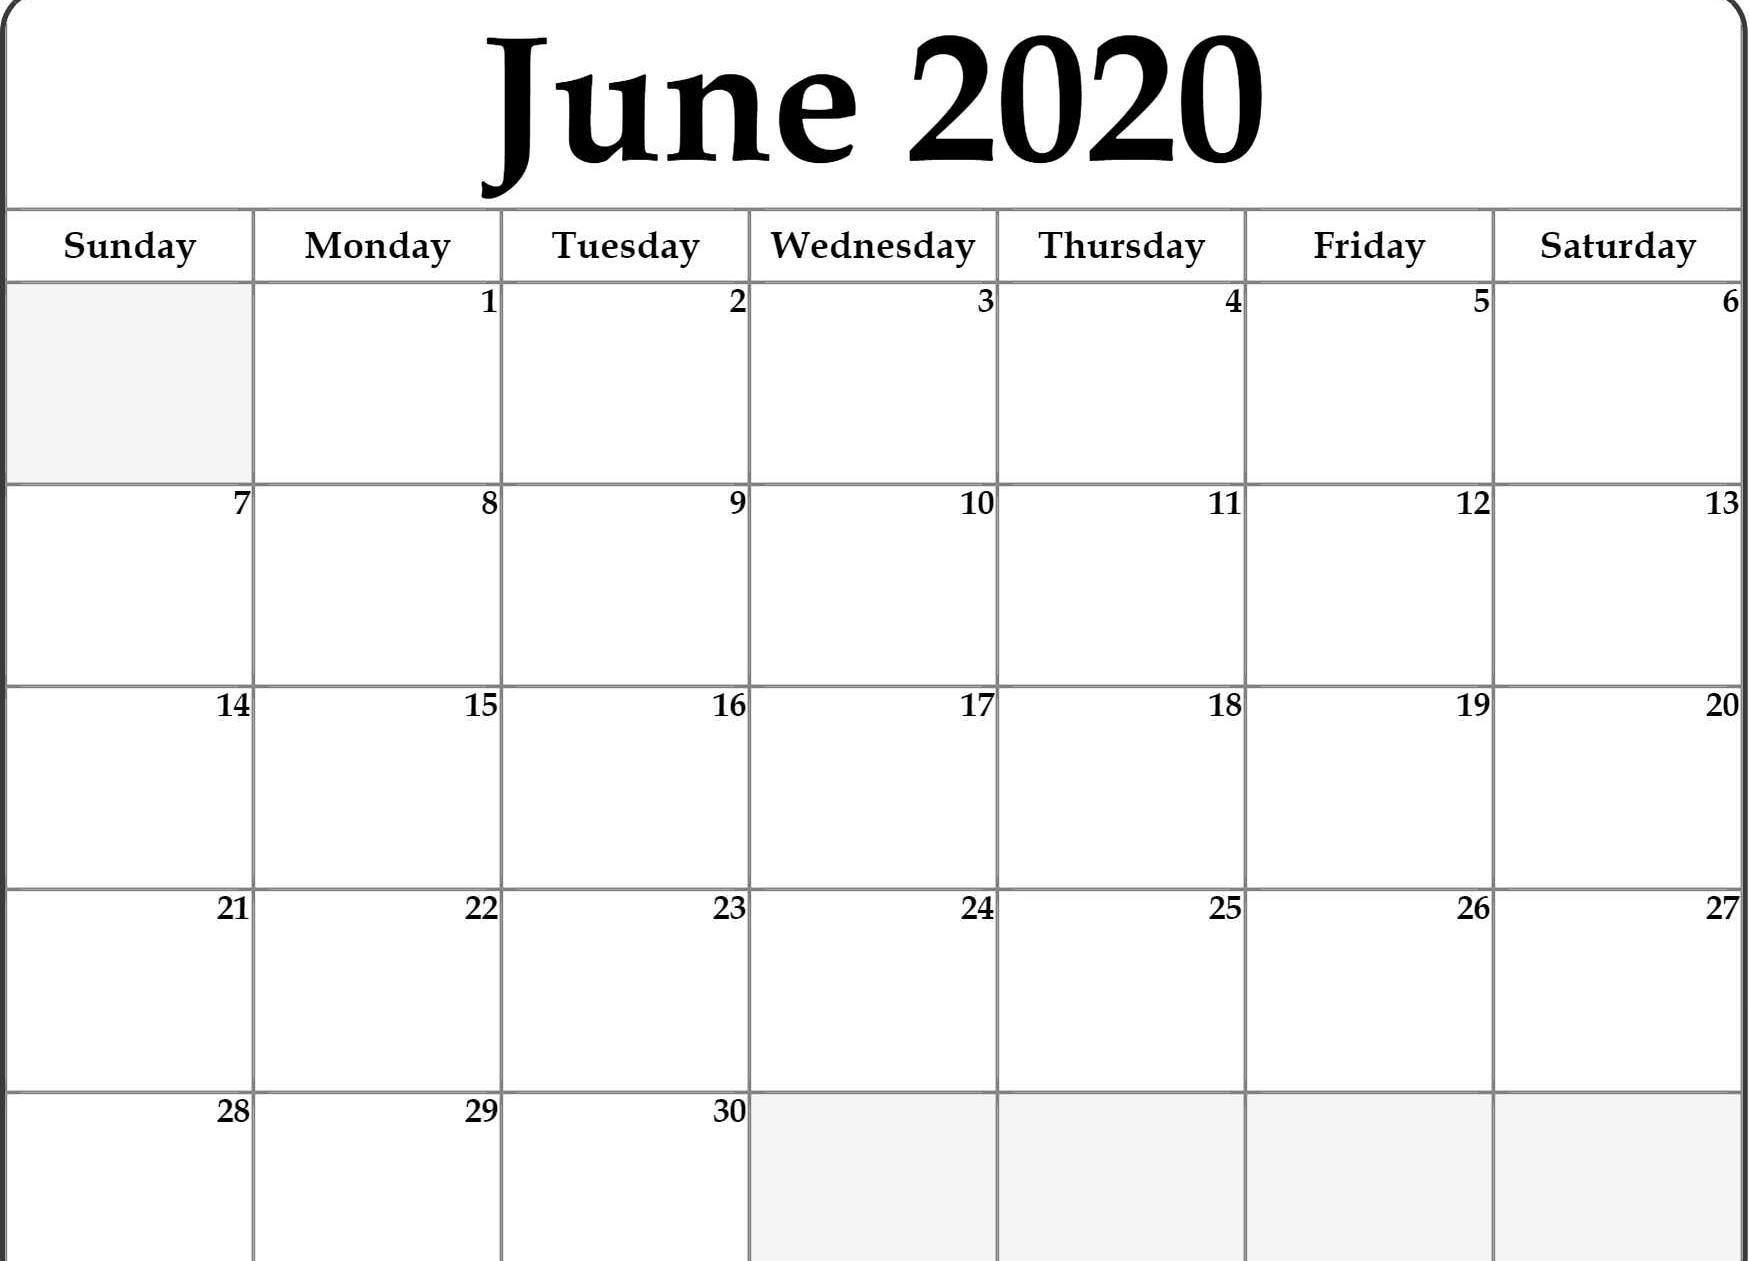 June Calendar 2020 Free Printable Template Pdf Word Excel-Printable Calendar 2020 Monthly June July